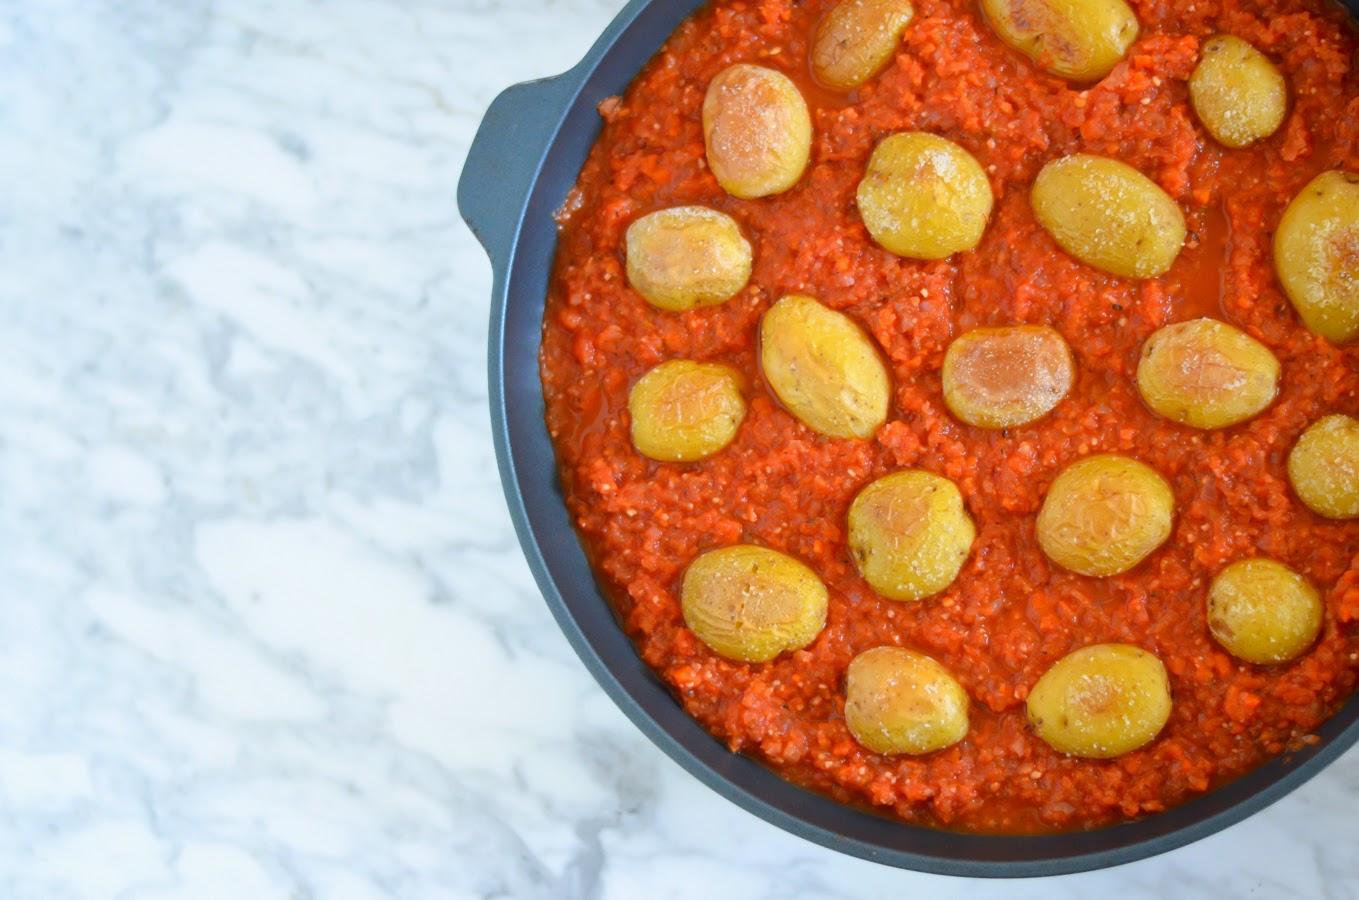 Salt Roasted Potatoes in Spanish Bravas Sauce w. Melissa's Produce | Luci's Morsels :: LA Healthy Food Blog